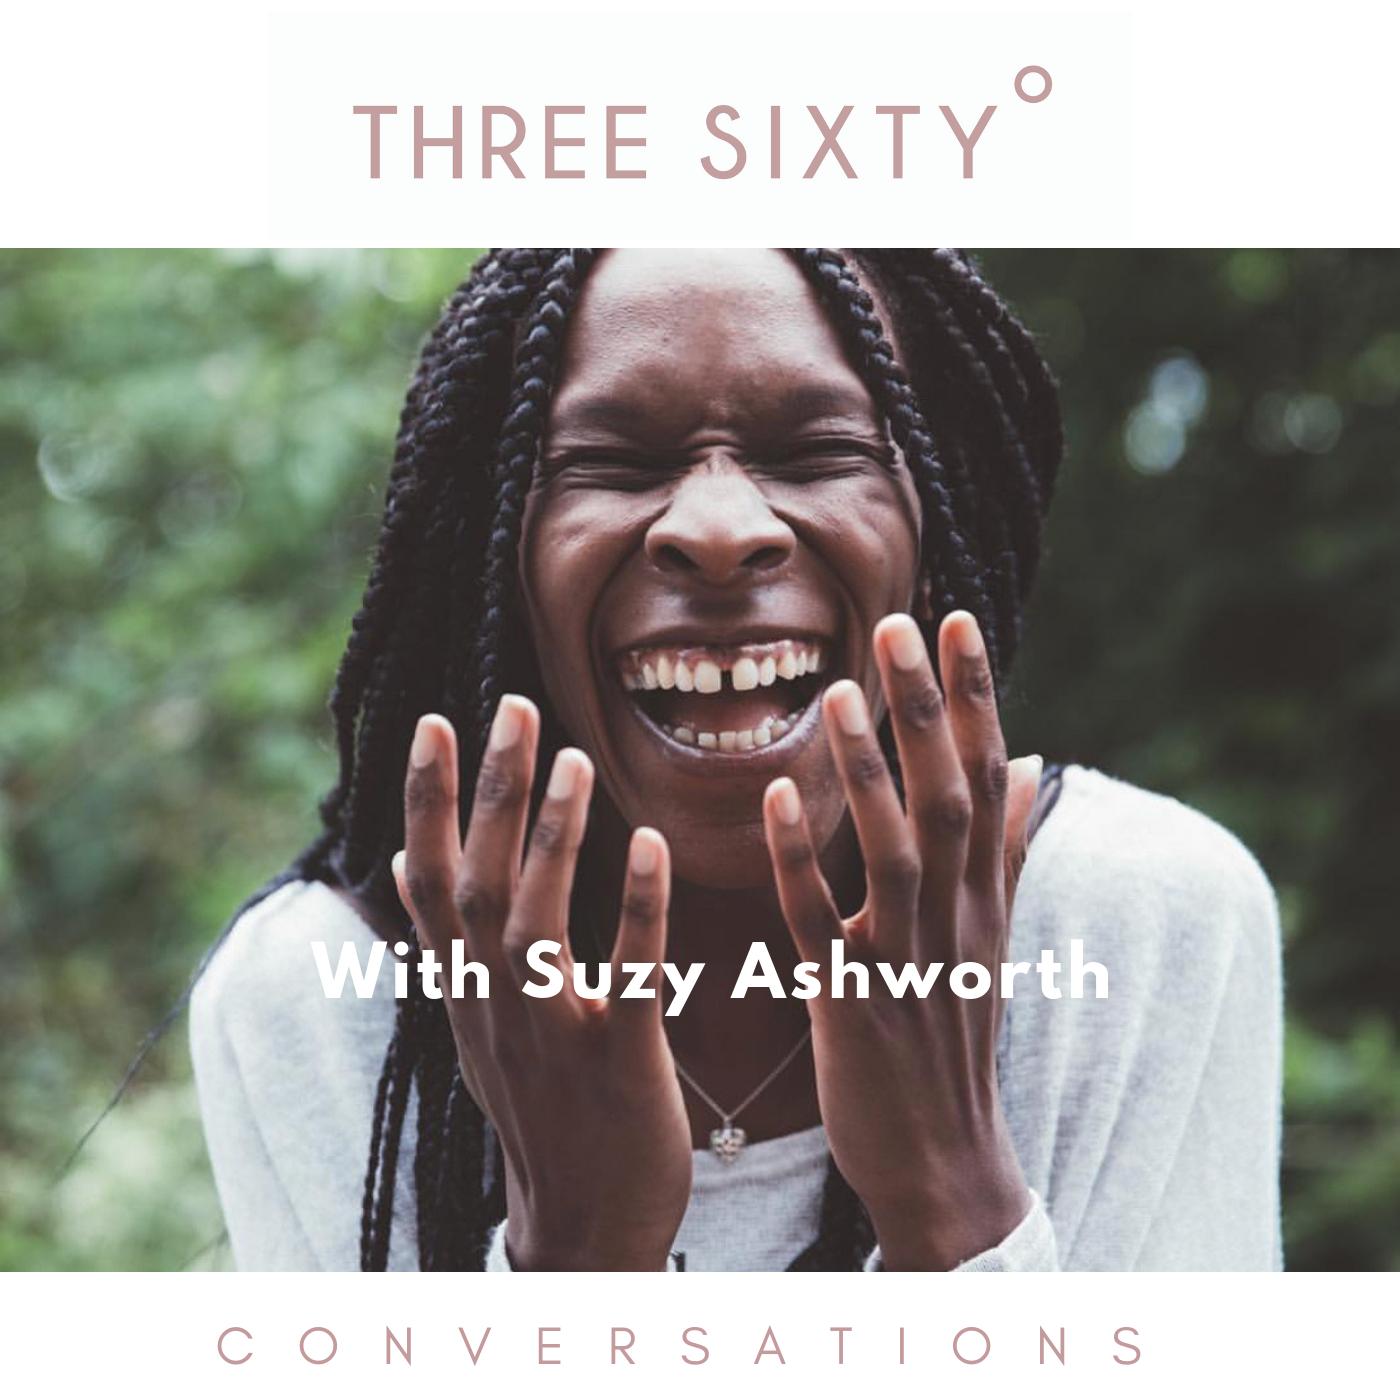 suzy ashworth, limitless life, wellbeing, 40+ blogs, live three sixty, tamu Thomas, hay house, well read black girl, black British motherhood, female founder uk, black female founder uk, diversity